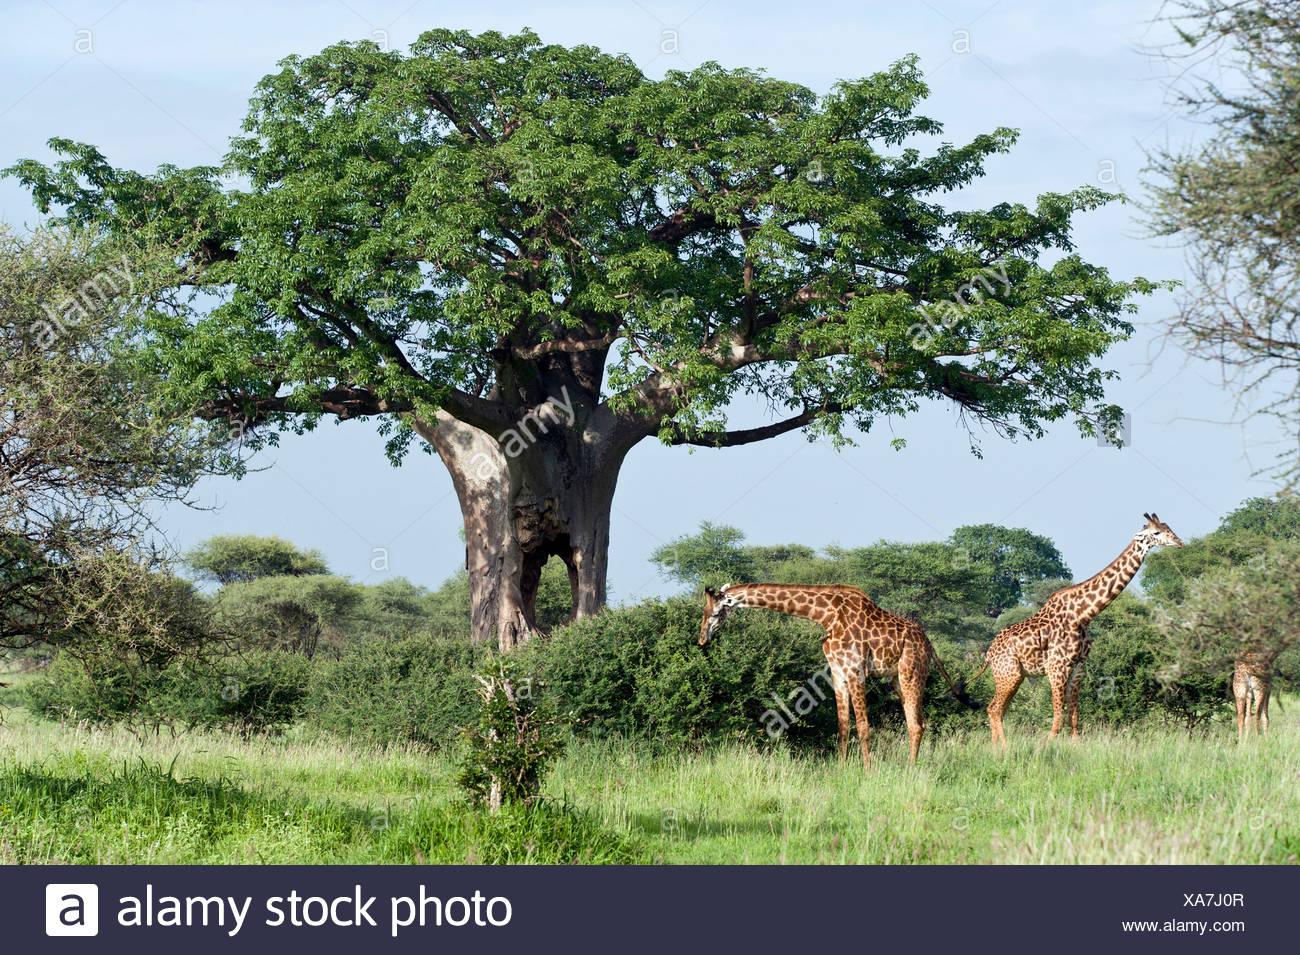 Rothschild's Giraffes, Giraffa camelopardalis rothschildi, under baobab tree, Tarangire National Park, Tansania, Africa - Stock Image